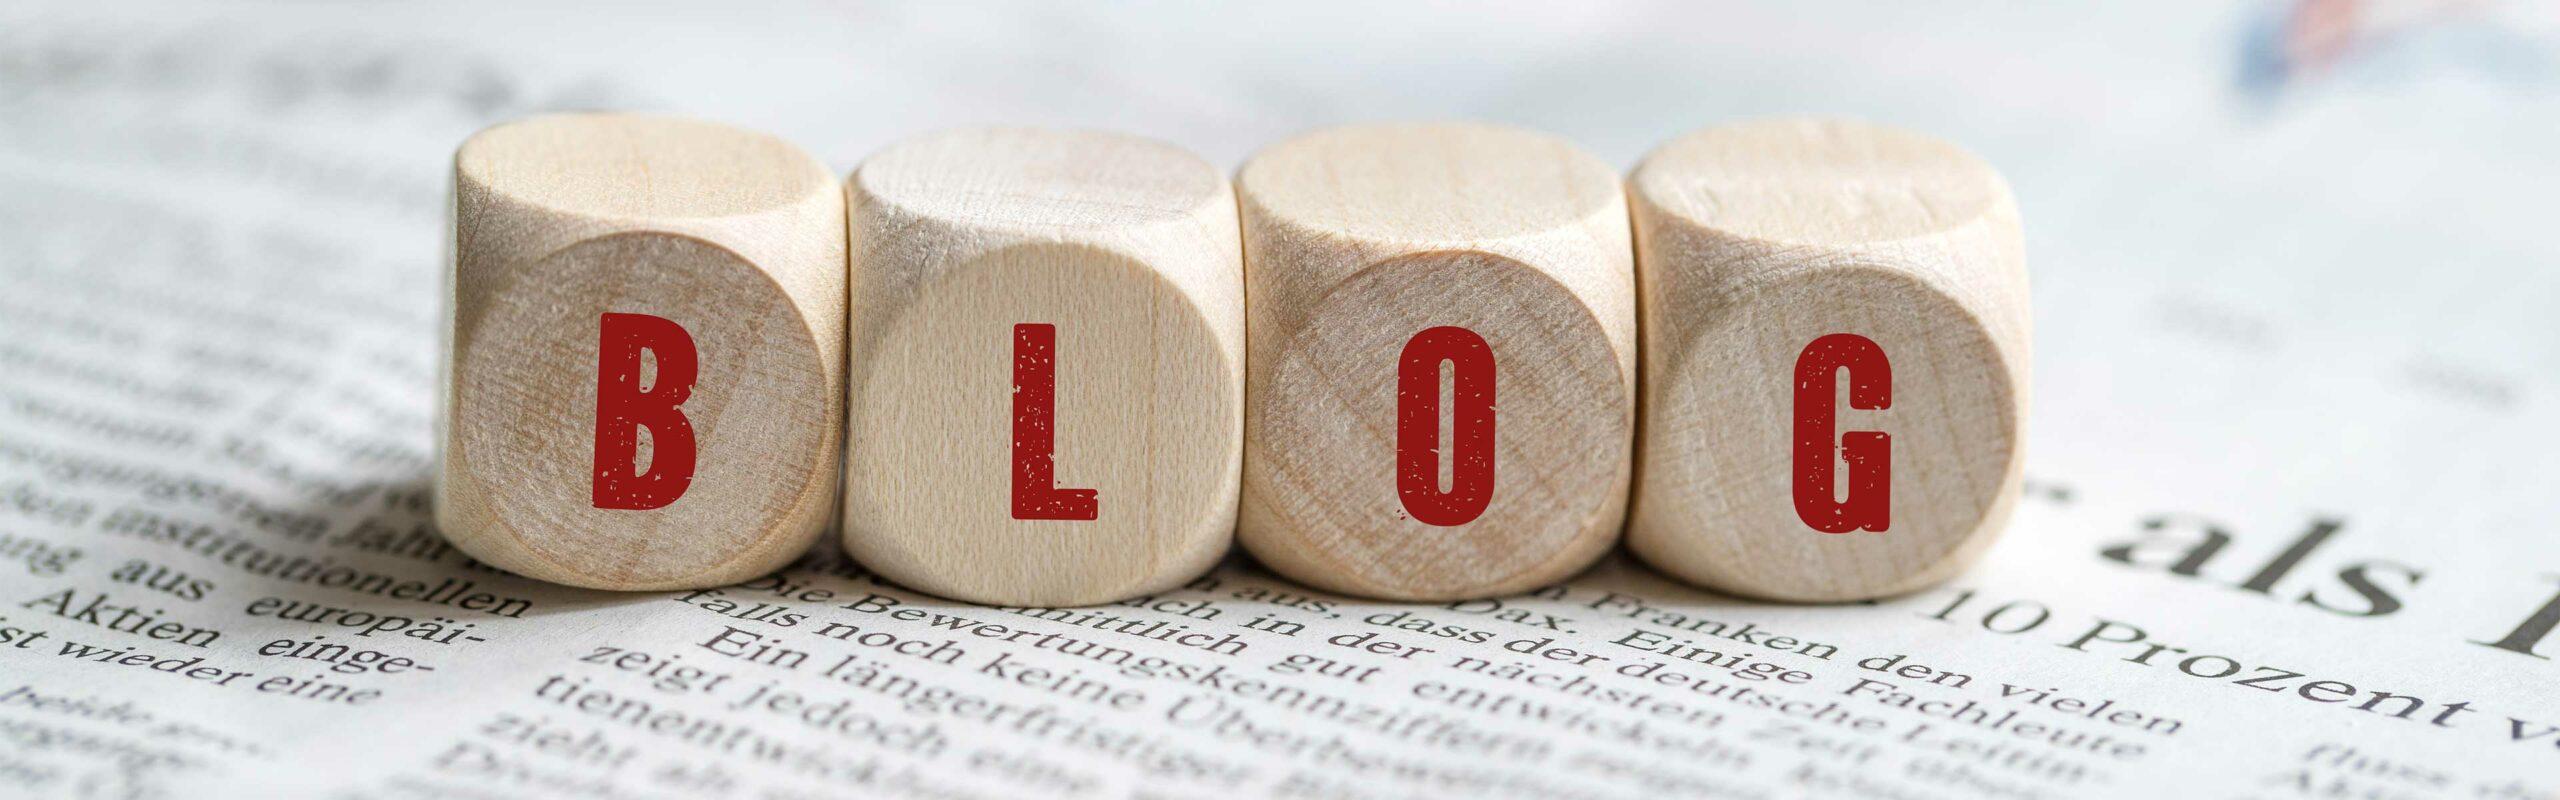 Allistro Private Equity Blog